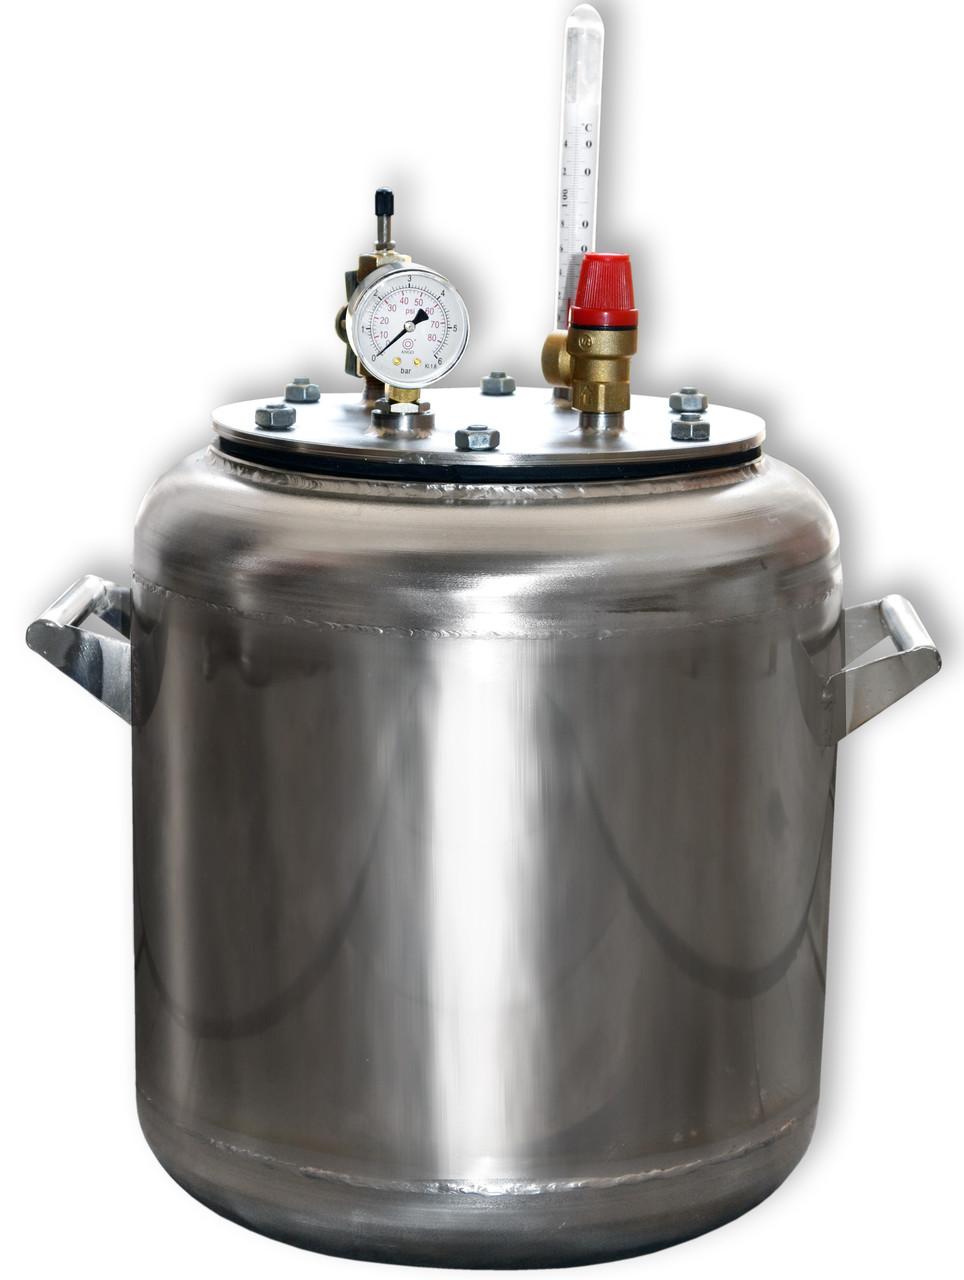 Автоклав газовый А16 нержавеющая сталь (0,5л - 16шт, 1л - 7шт)